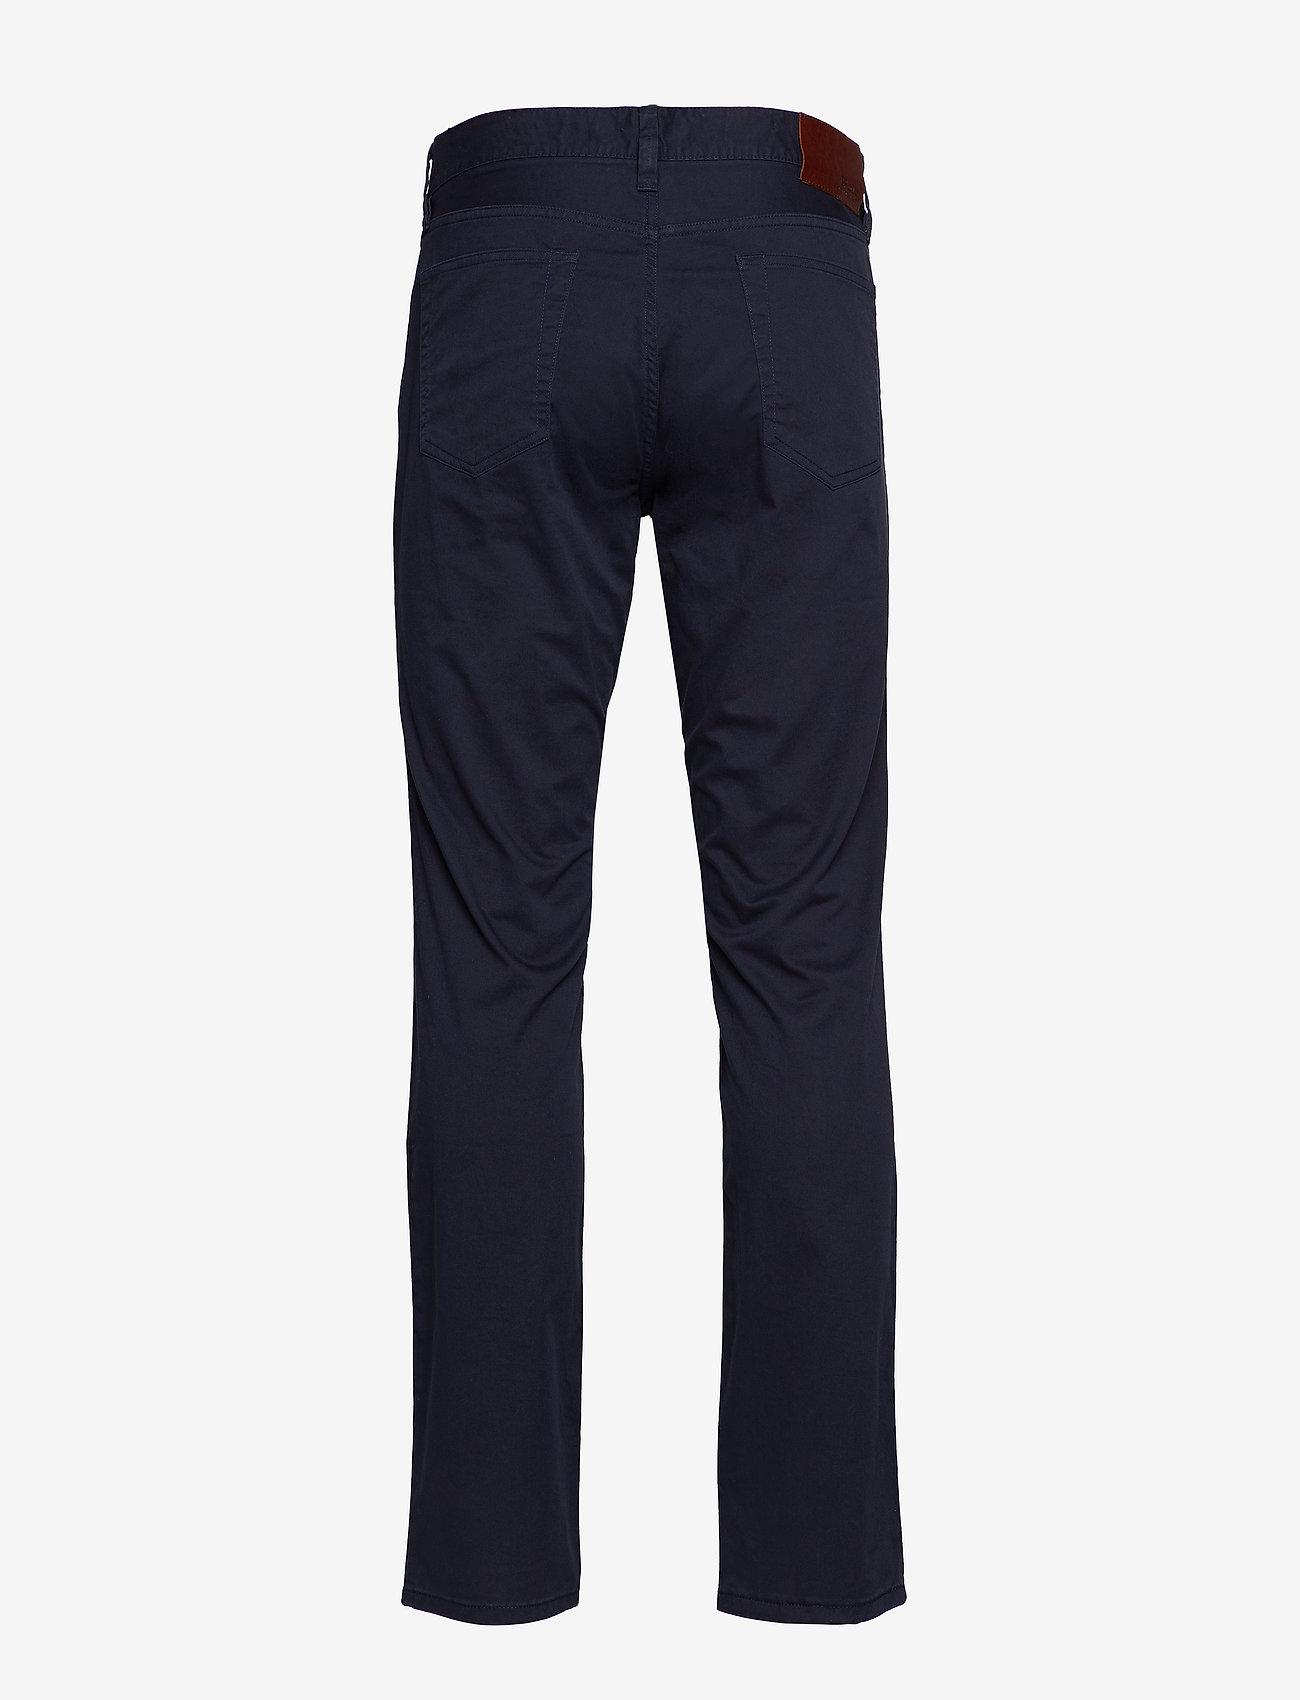 Polo Ralph Lauren - VARICK SLIM STRAIGHT - slim jeans - aviator navy - 1